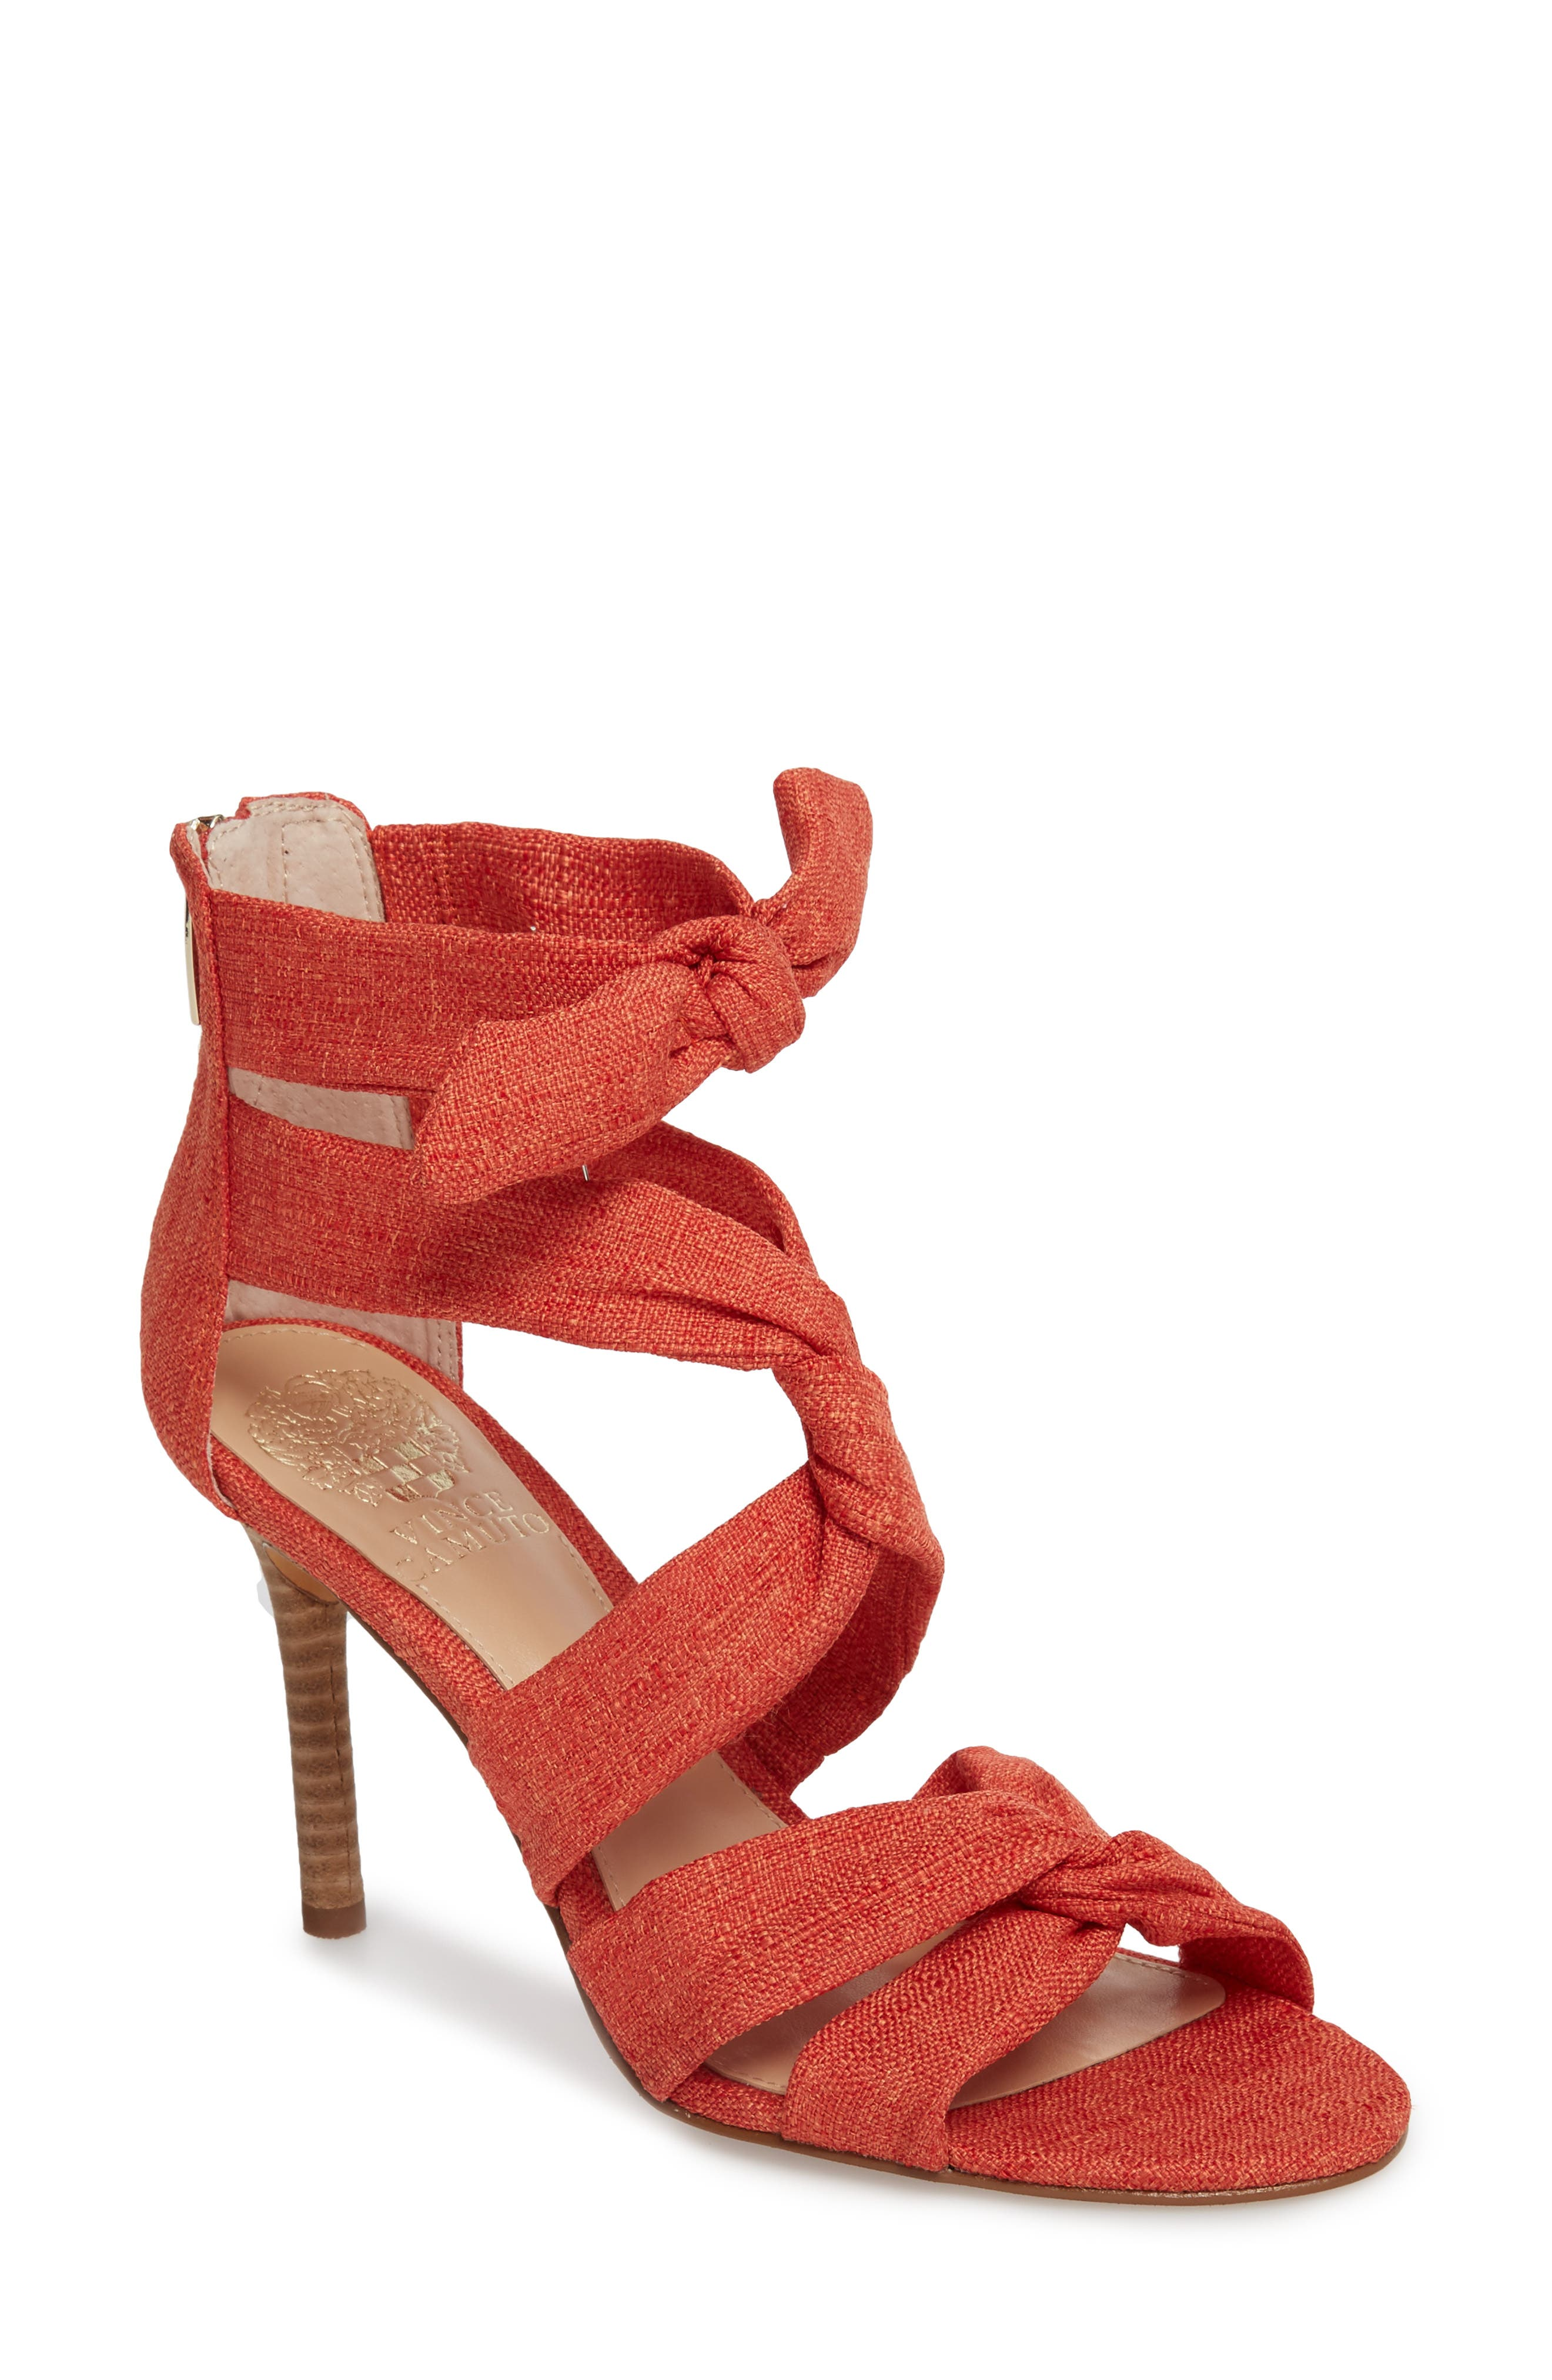 Chania Sandal,                         Main,                         color, Sunset Orange